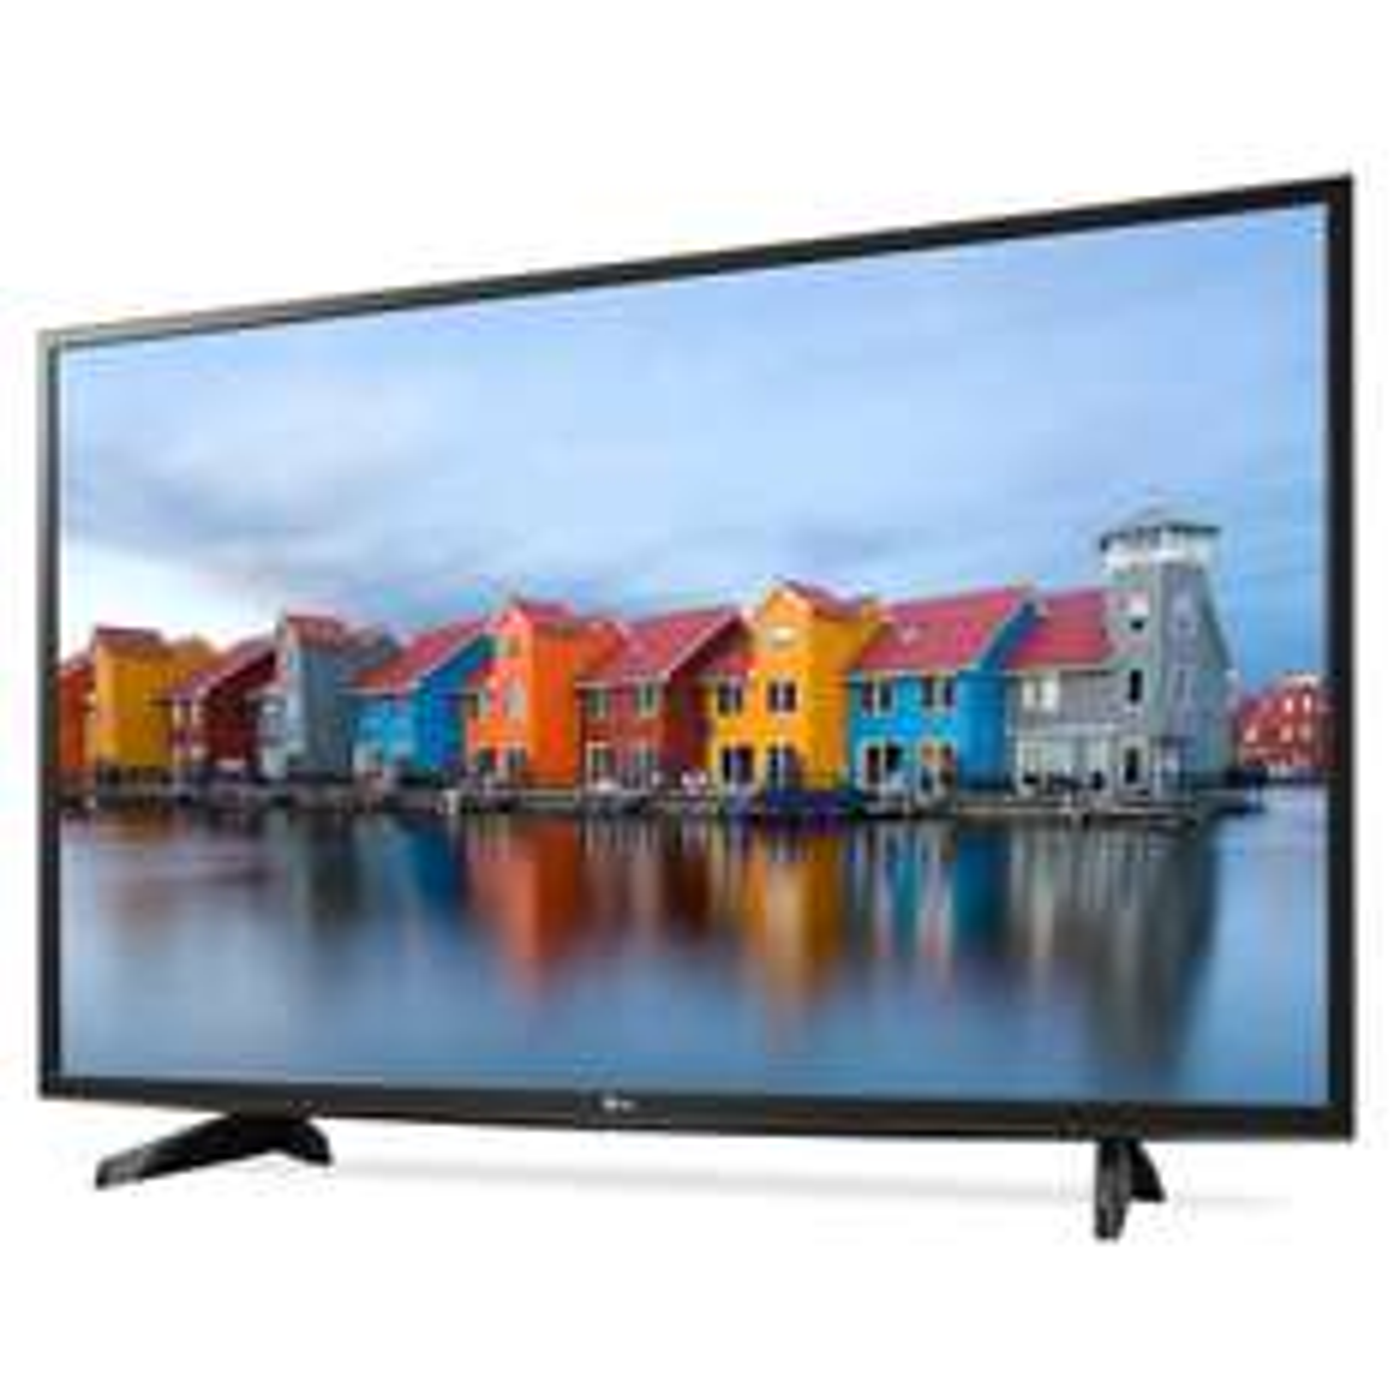 "Amazon aniversario: Smart TV LG 43"" 43LH5700 $5,524 con AMEX, $5,849 con Banorte"